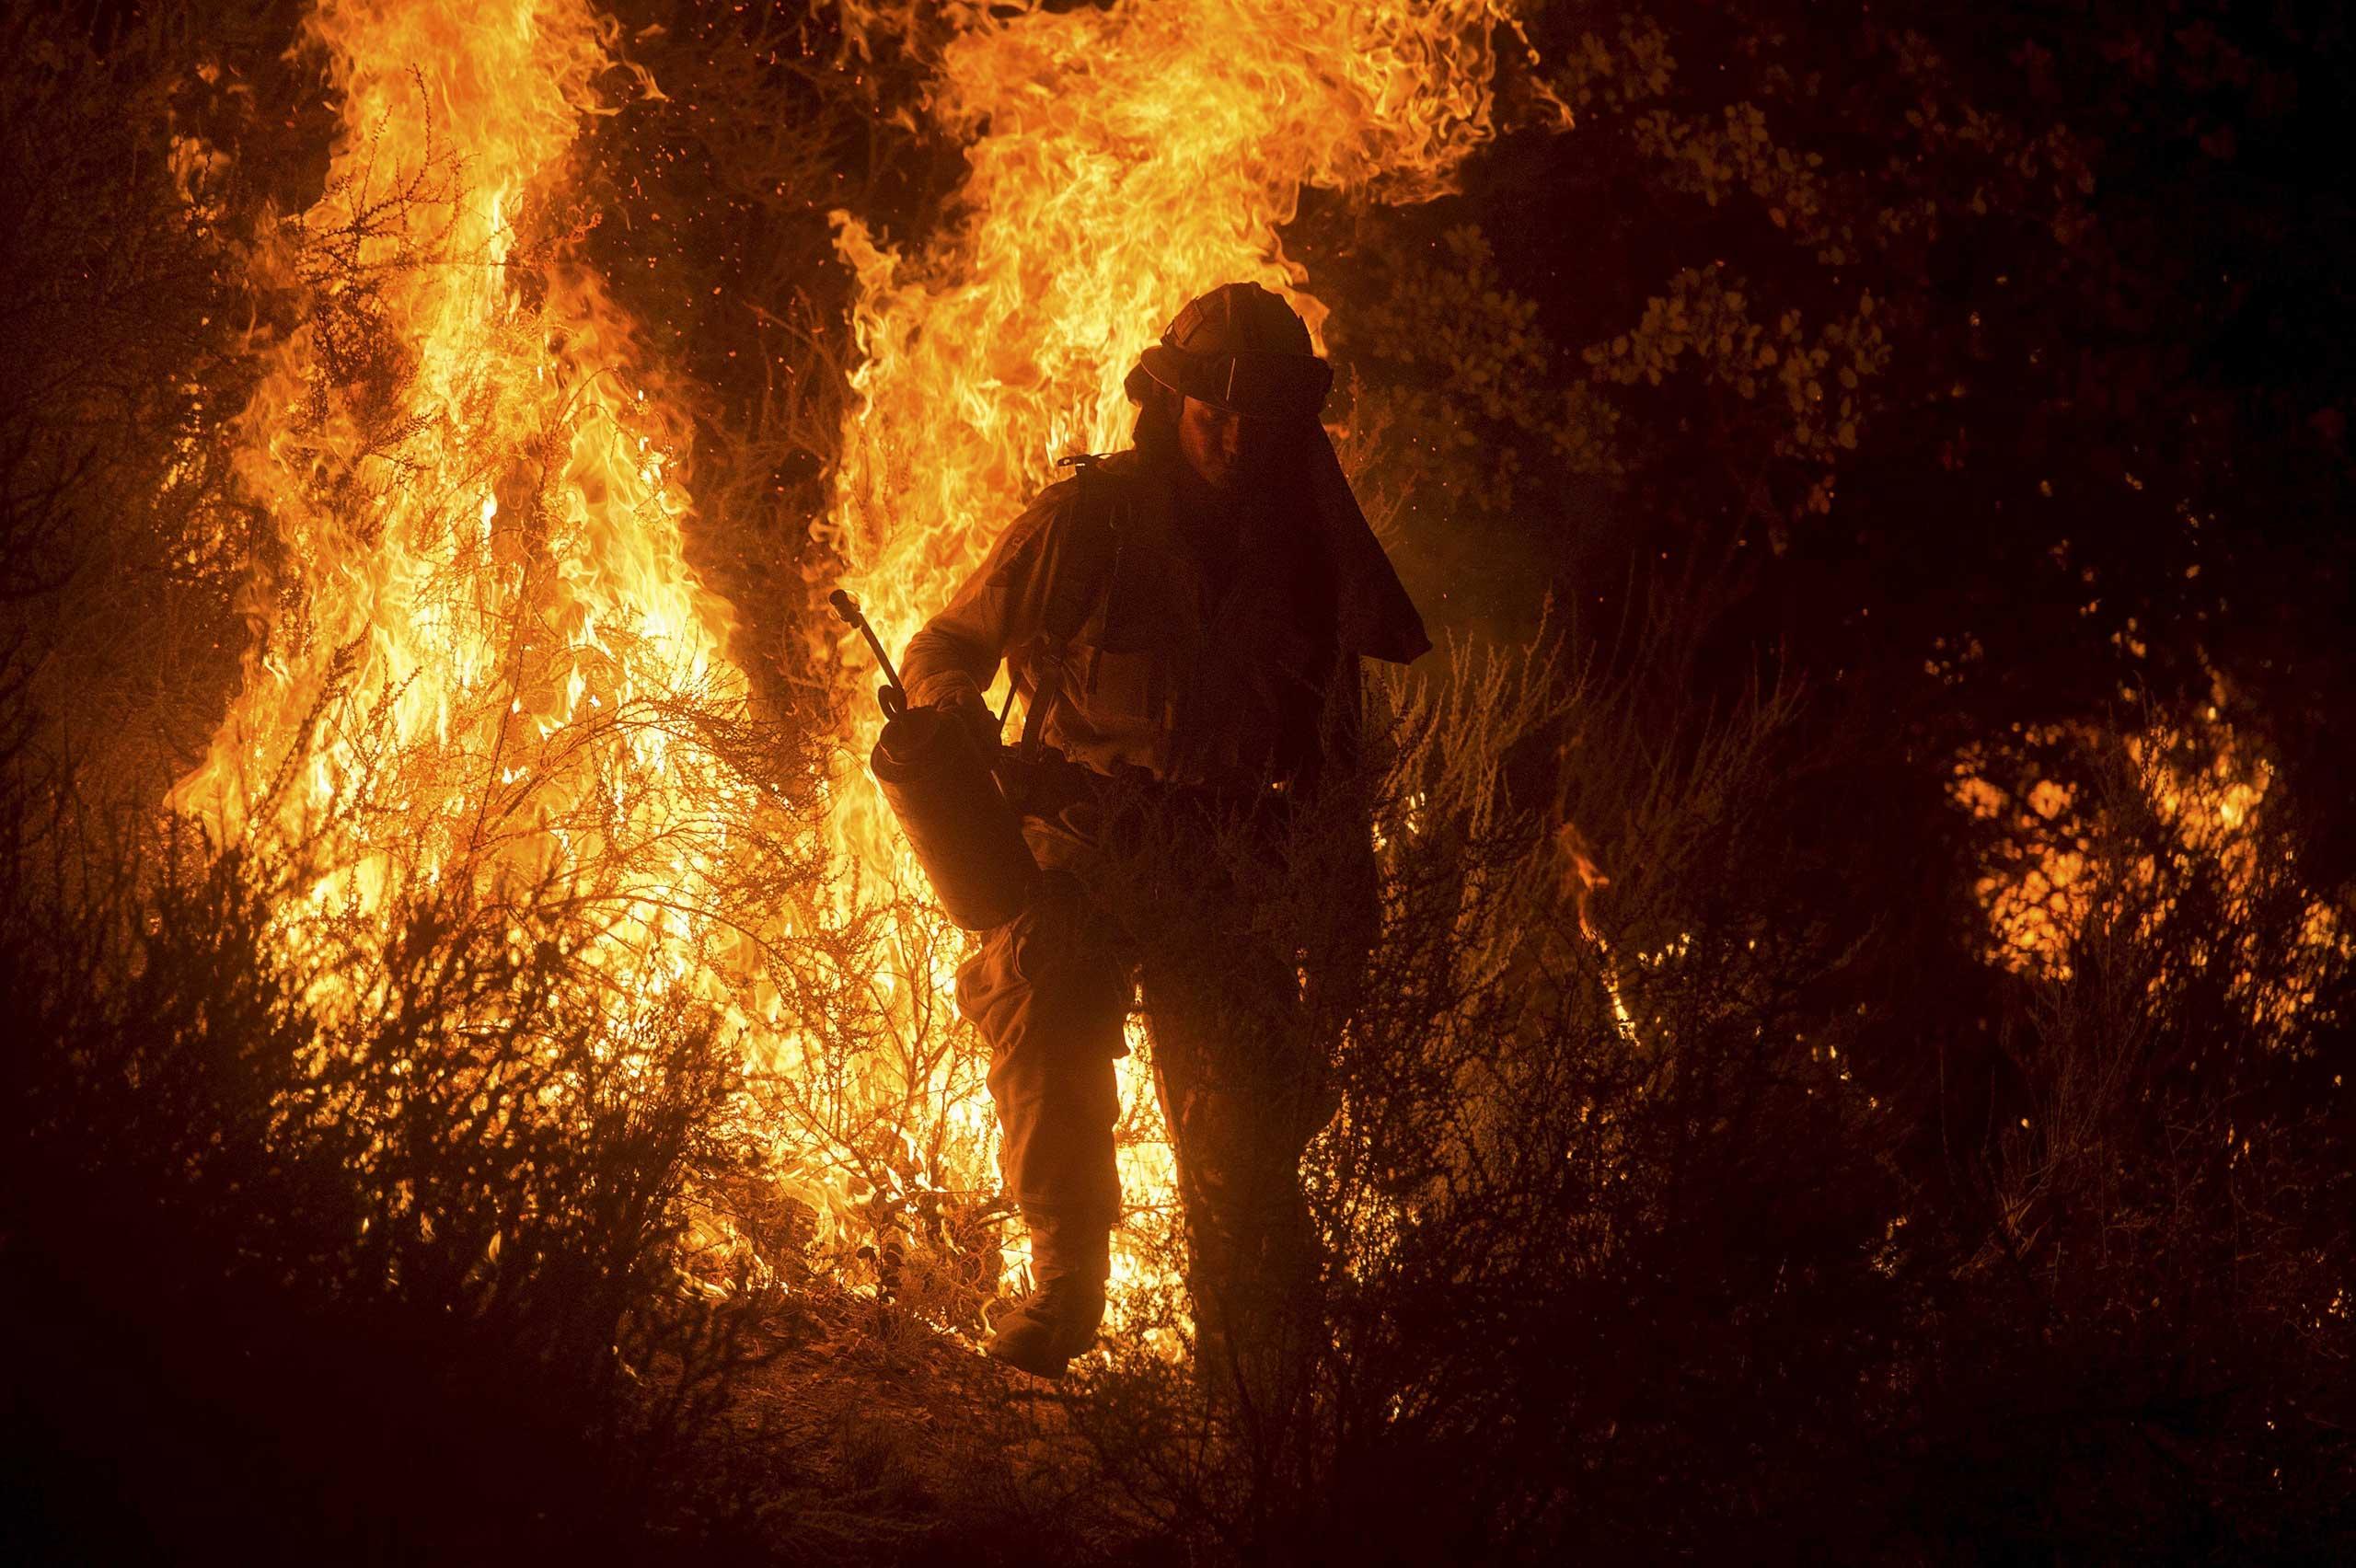 A firefighter lights a backfire while battling the Butte fire near San Andreas, California September 12, 2015.